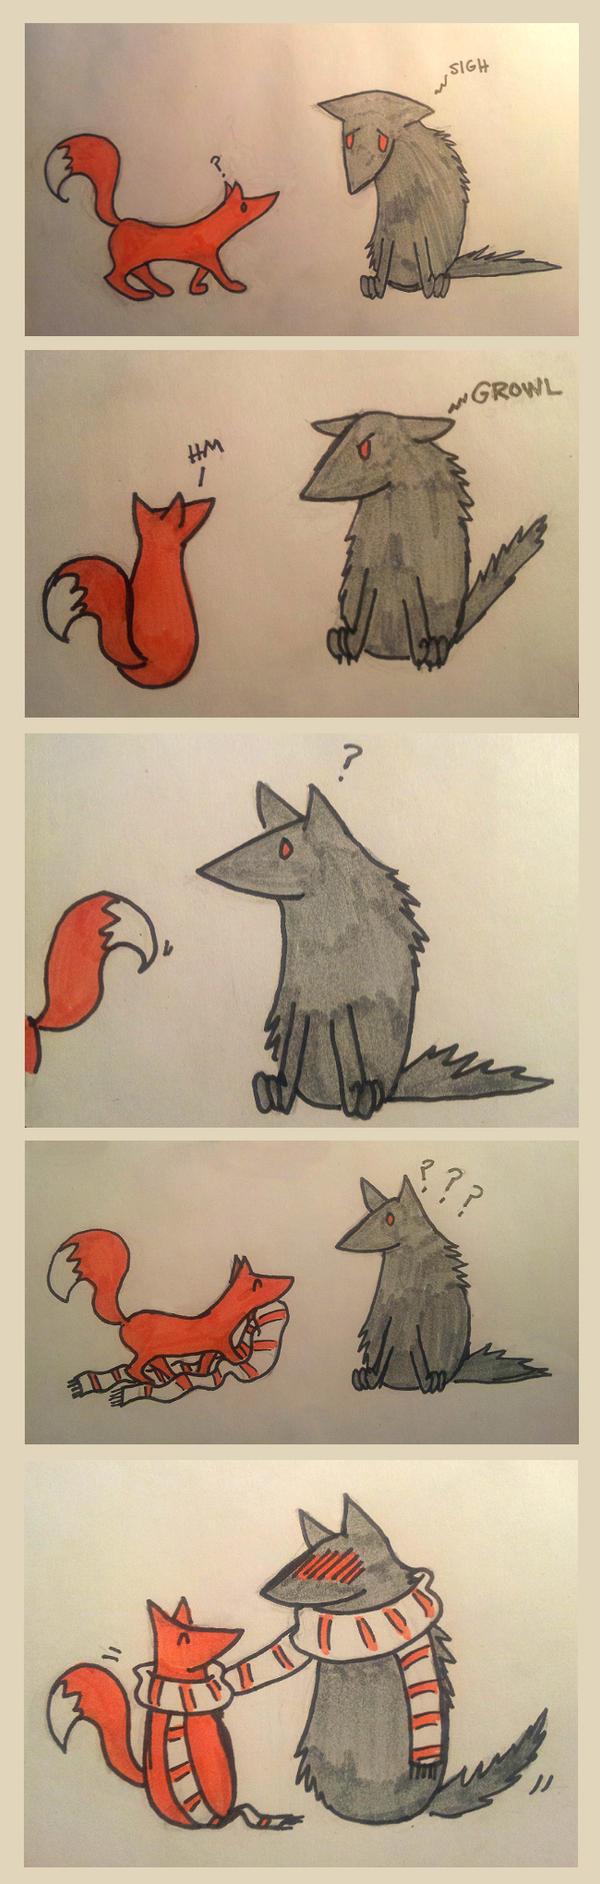 how to make a sour